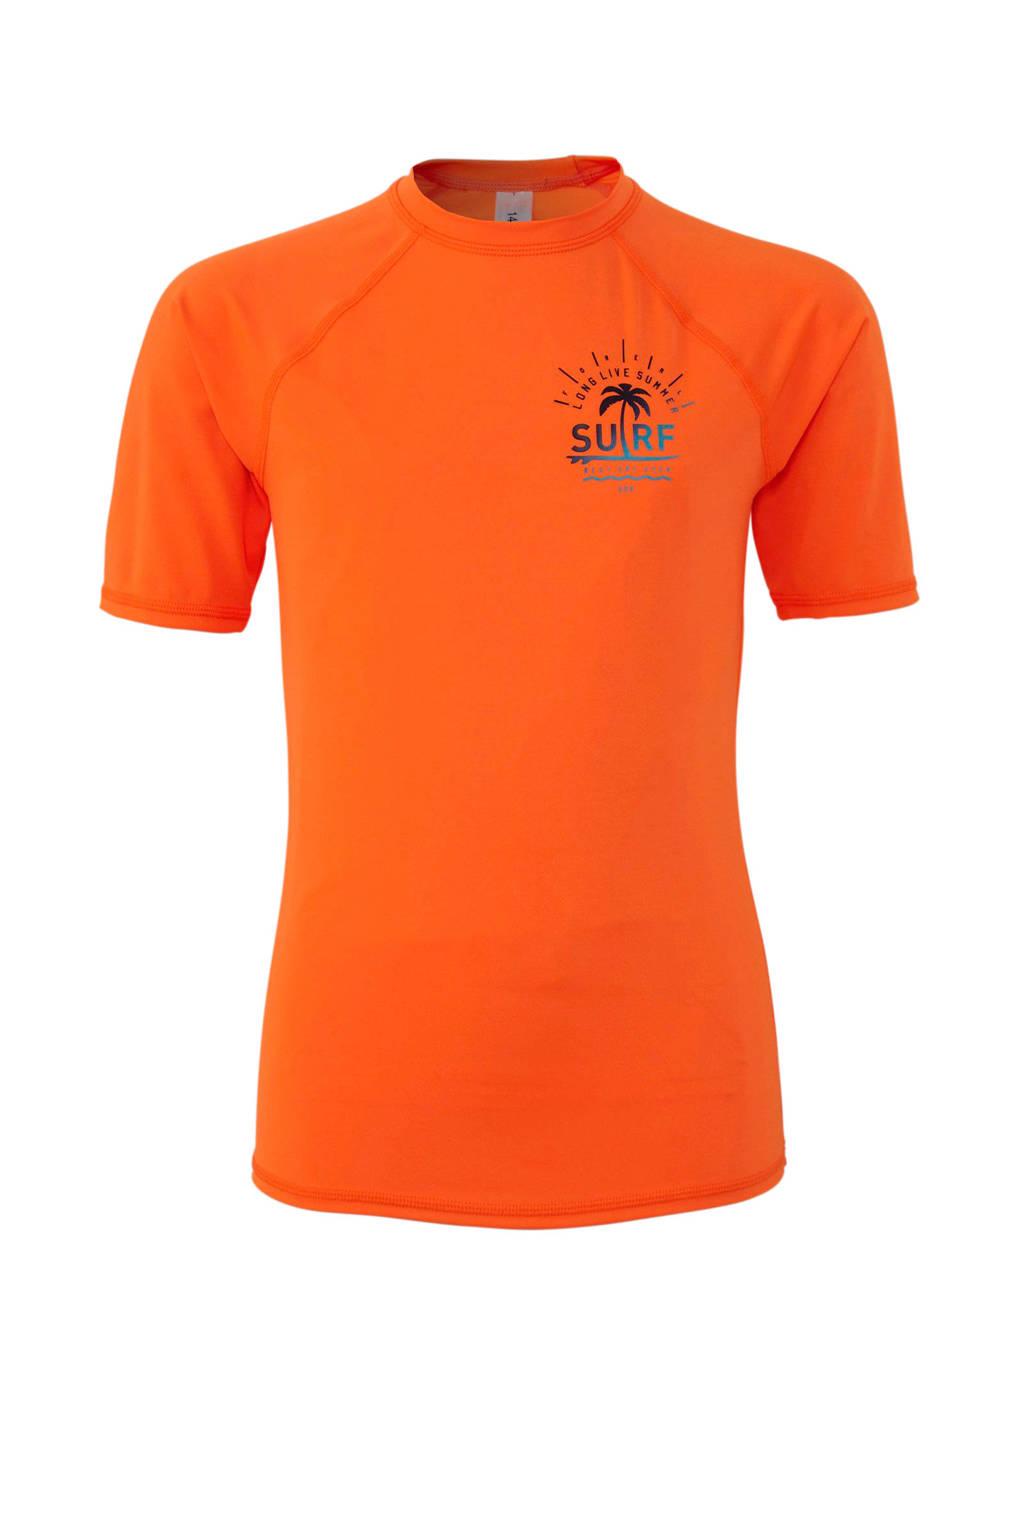 C&A Rodeo UV T-shirt met printopdruk neon oranje, Neon oranje